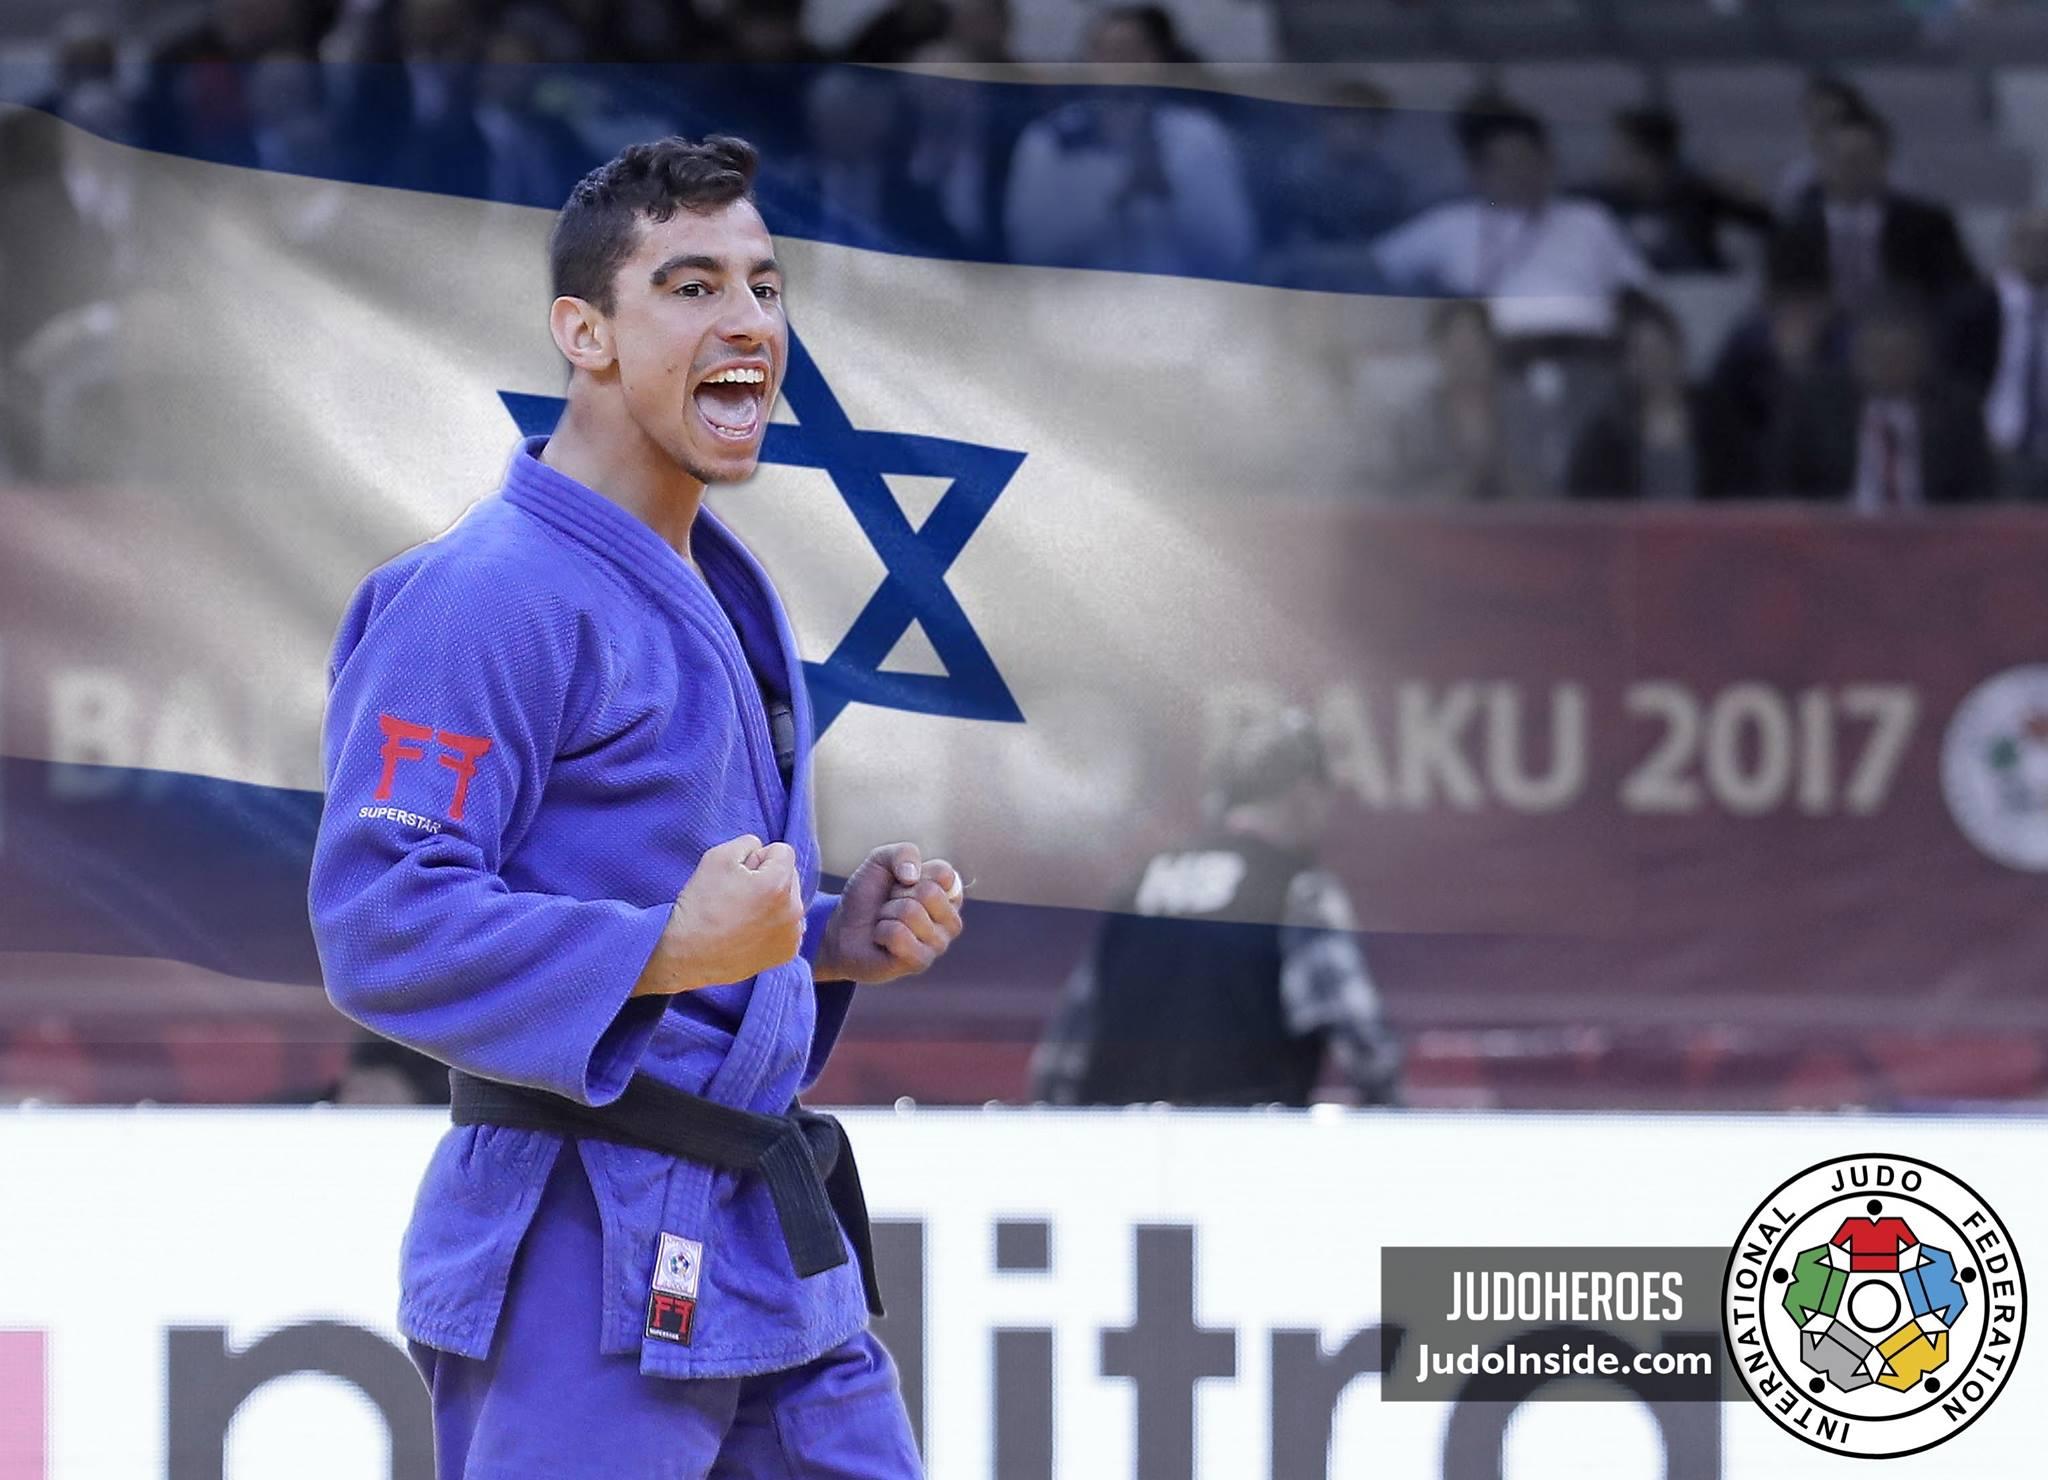 Le judoka Tal Flicker médaillé d'or: